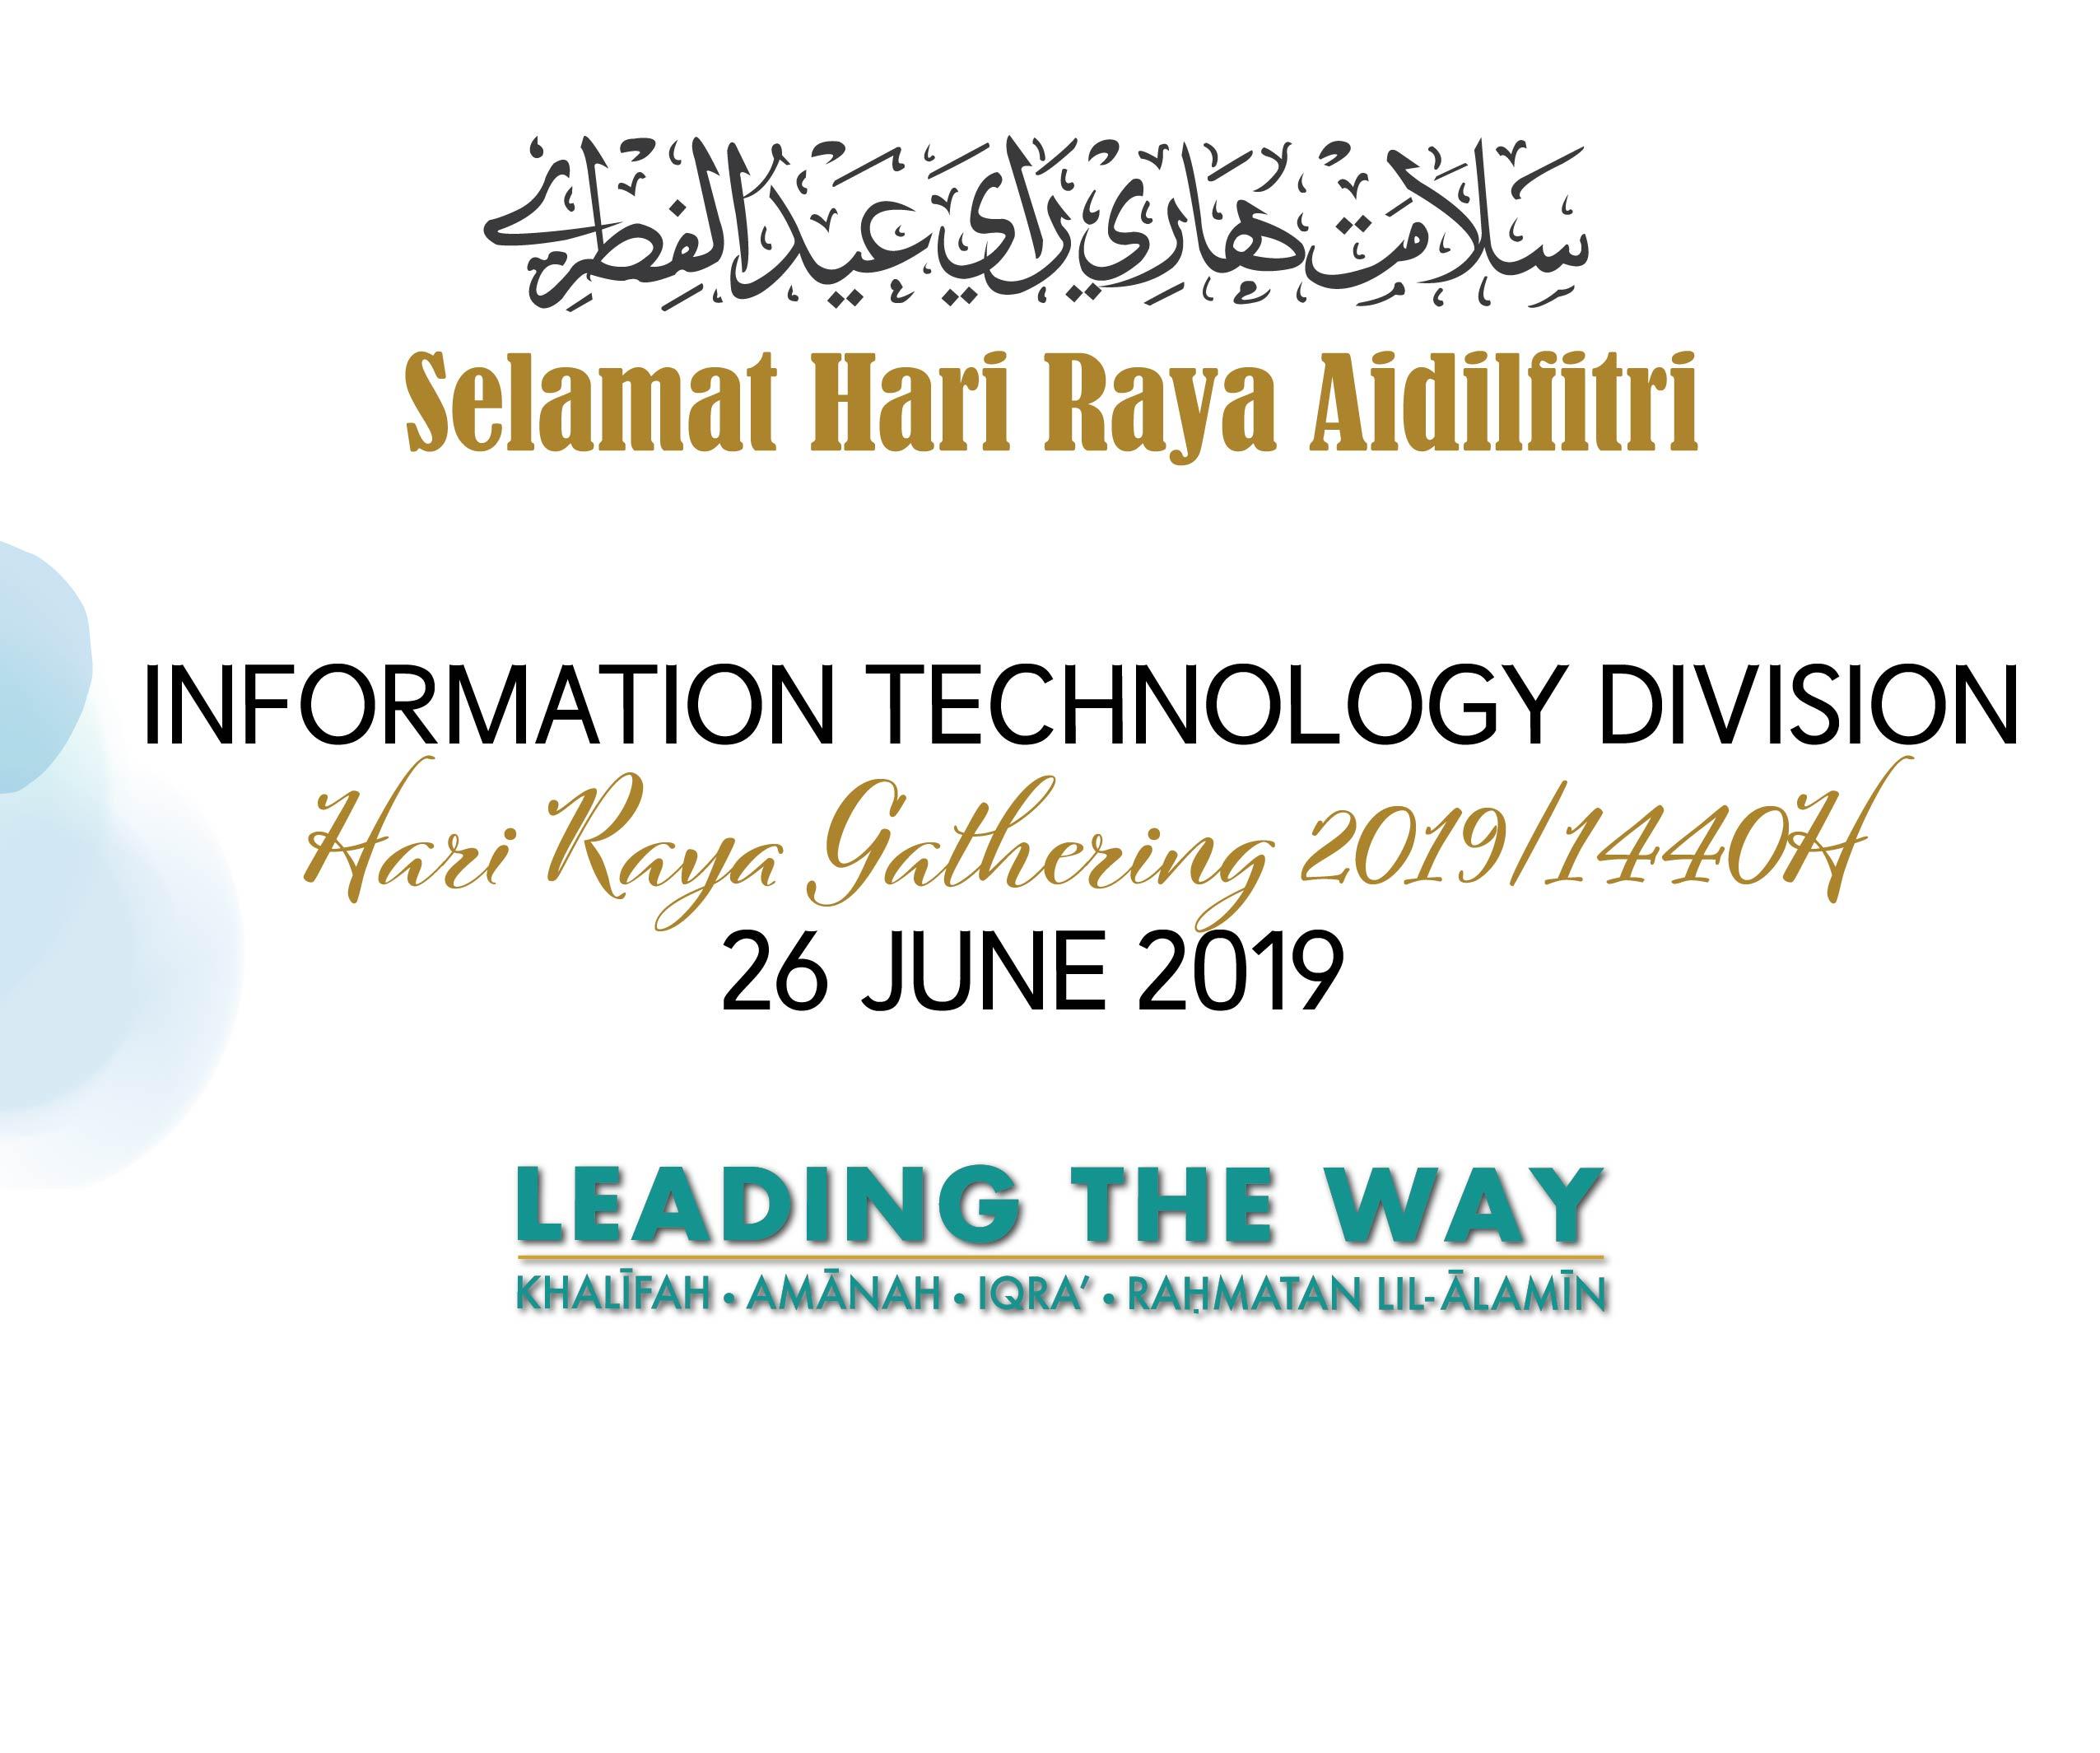 ITD HARI RAYA GATHERING 2019/1440H